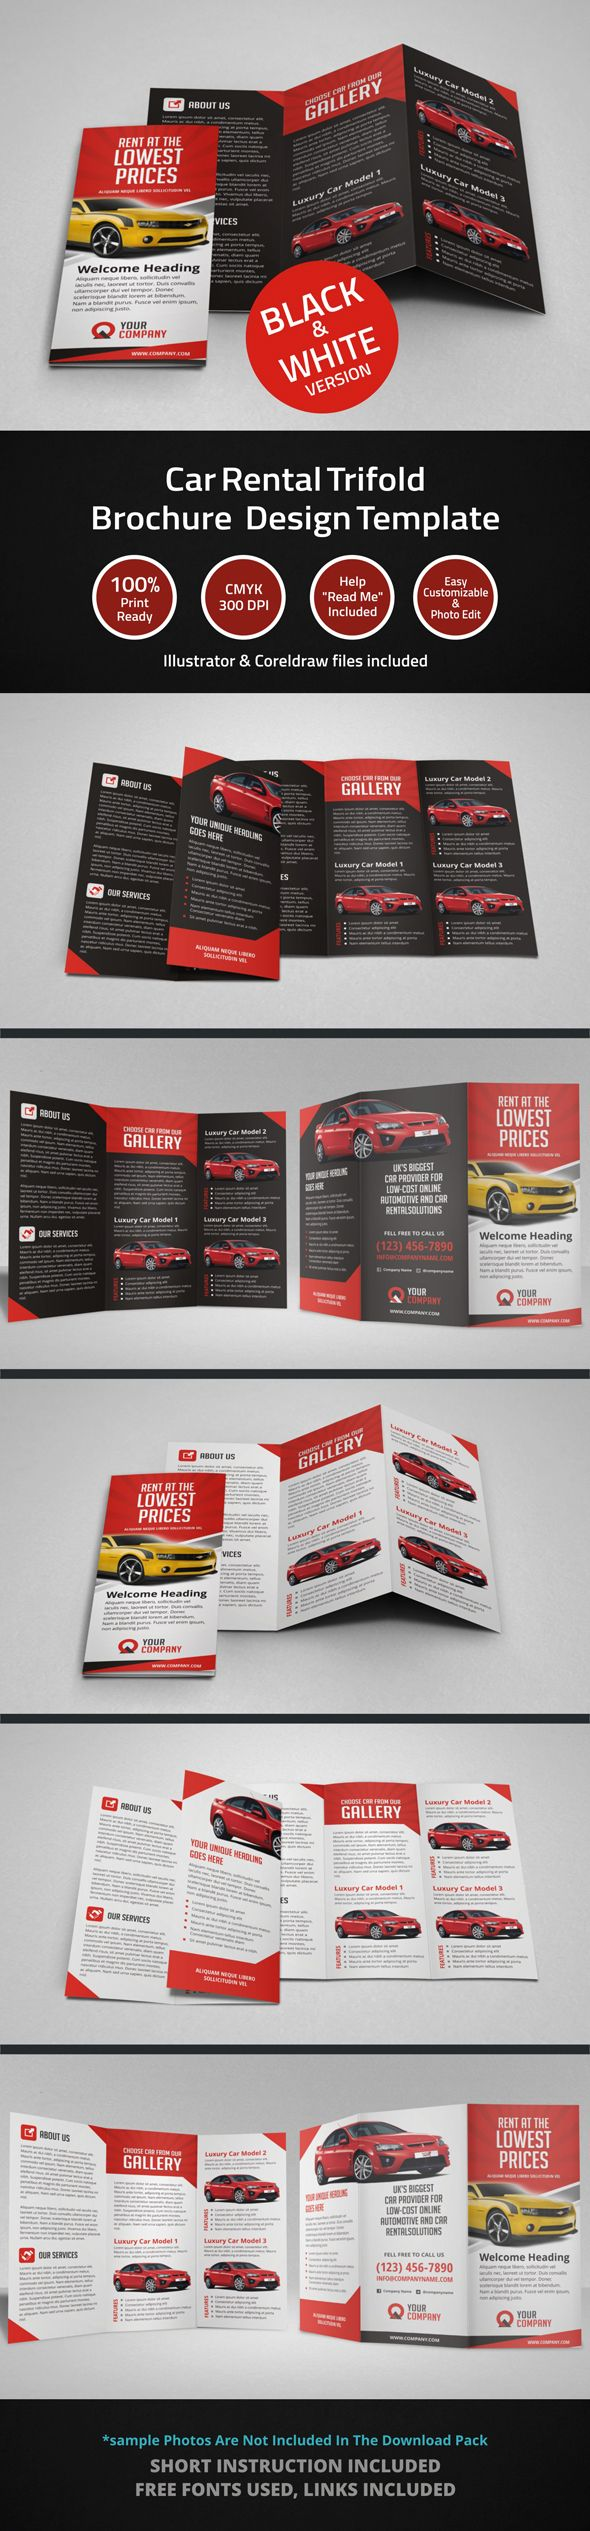 Carpet cleaning receipt joy studio design gallery best design - 12 Best Brochure Ideas Images On Pinterest Brochure Ideas Advertising And Brochure Design